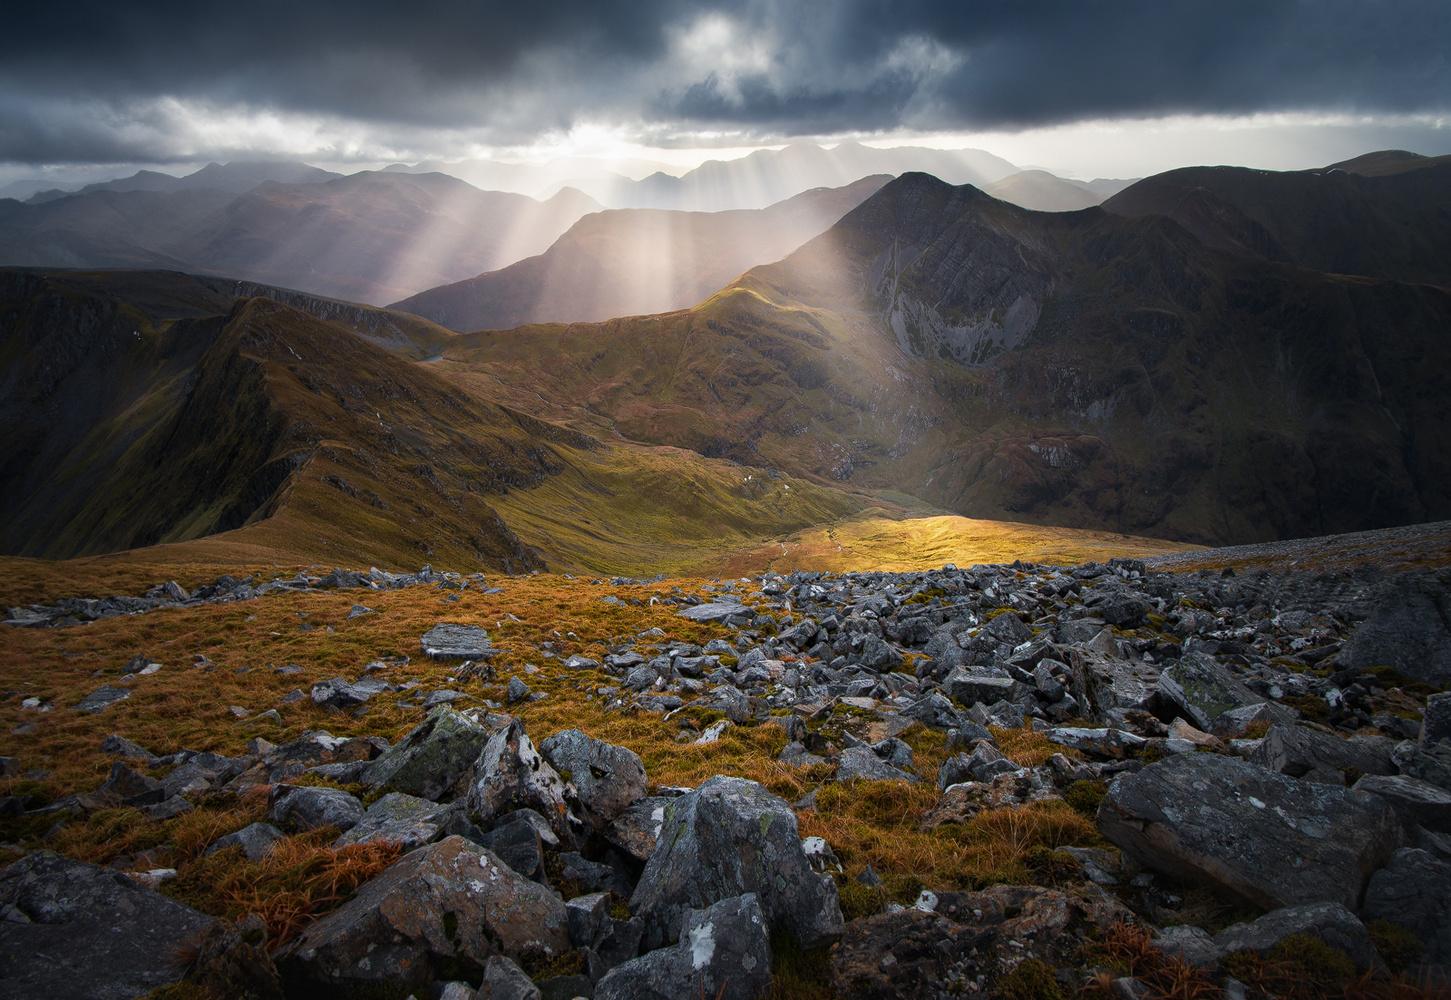 The Mountains of Heaven by Grzegorz Piechowicz